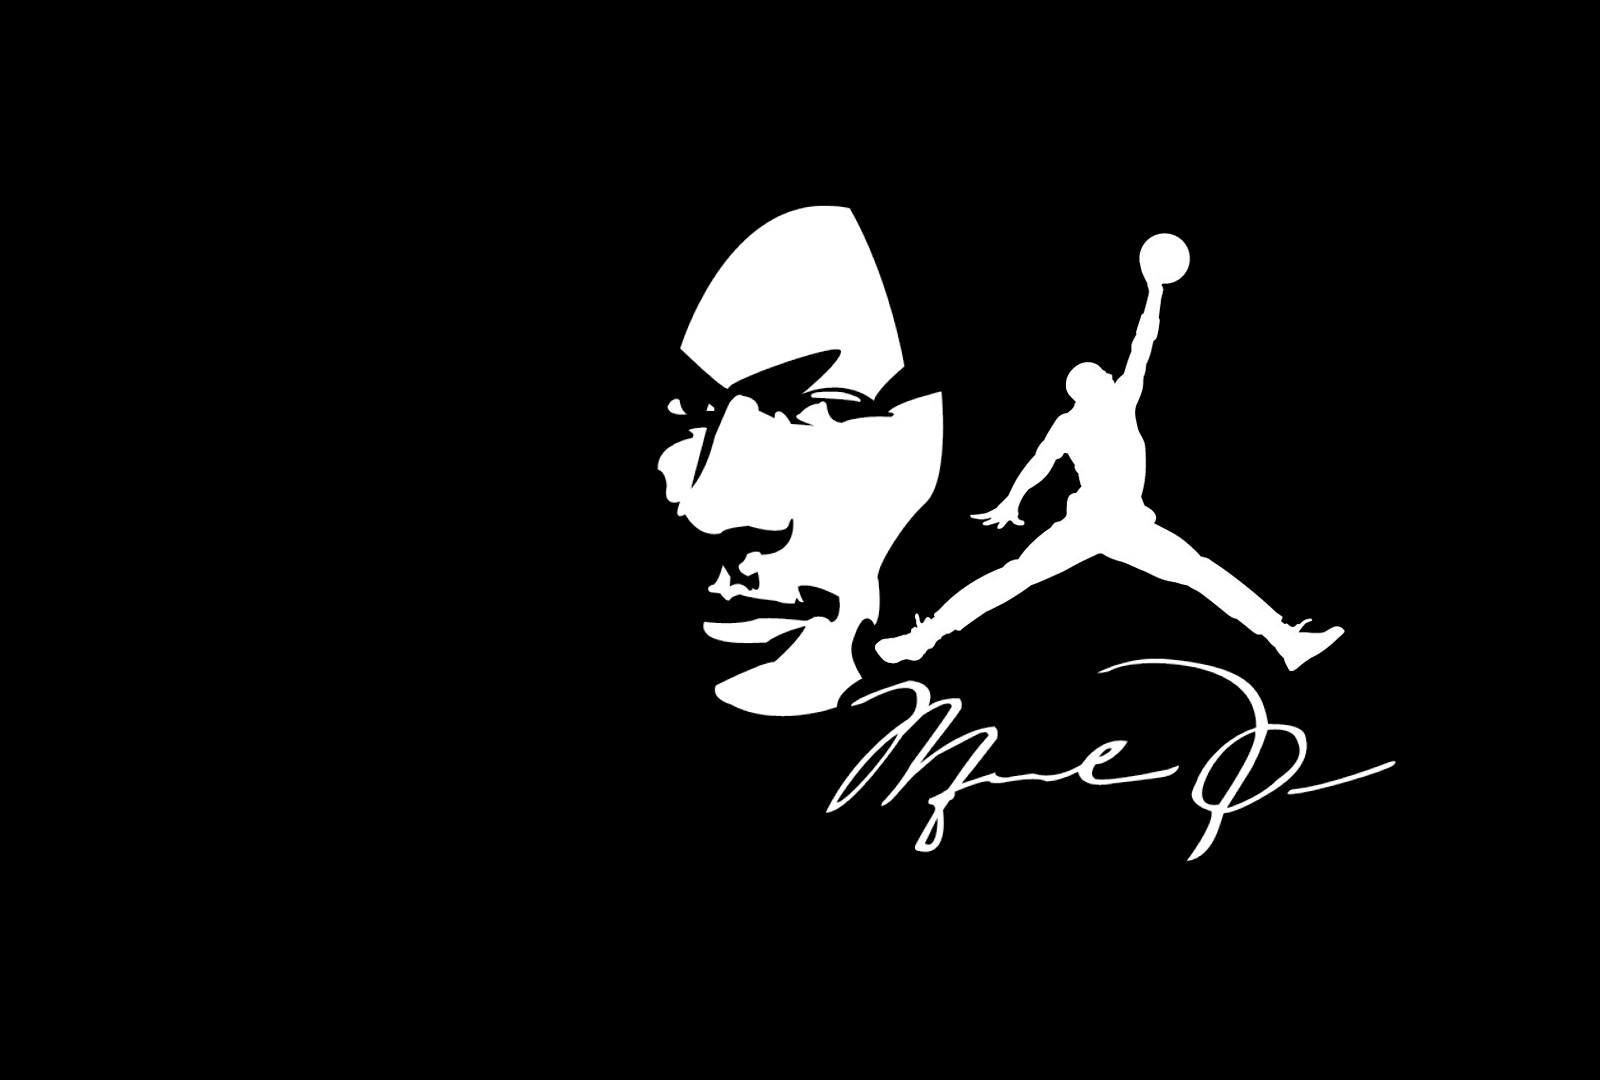 Wallpaper Illustration Silhouette Logo Michael Jordan Black